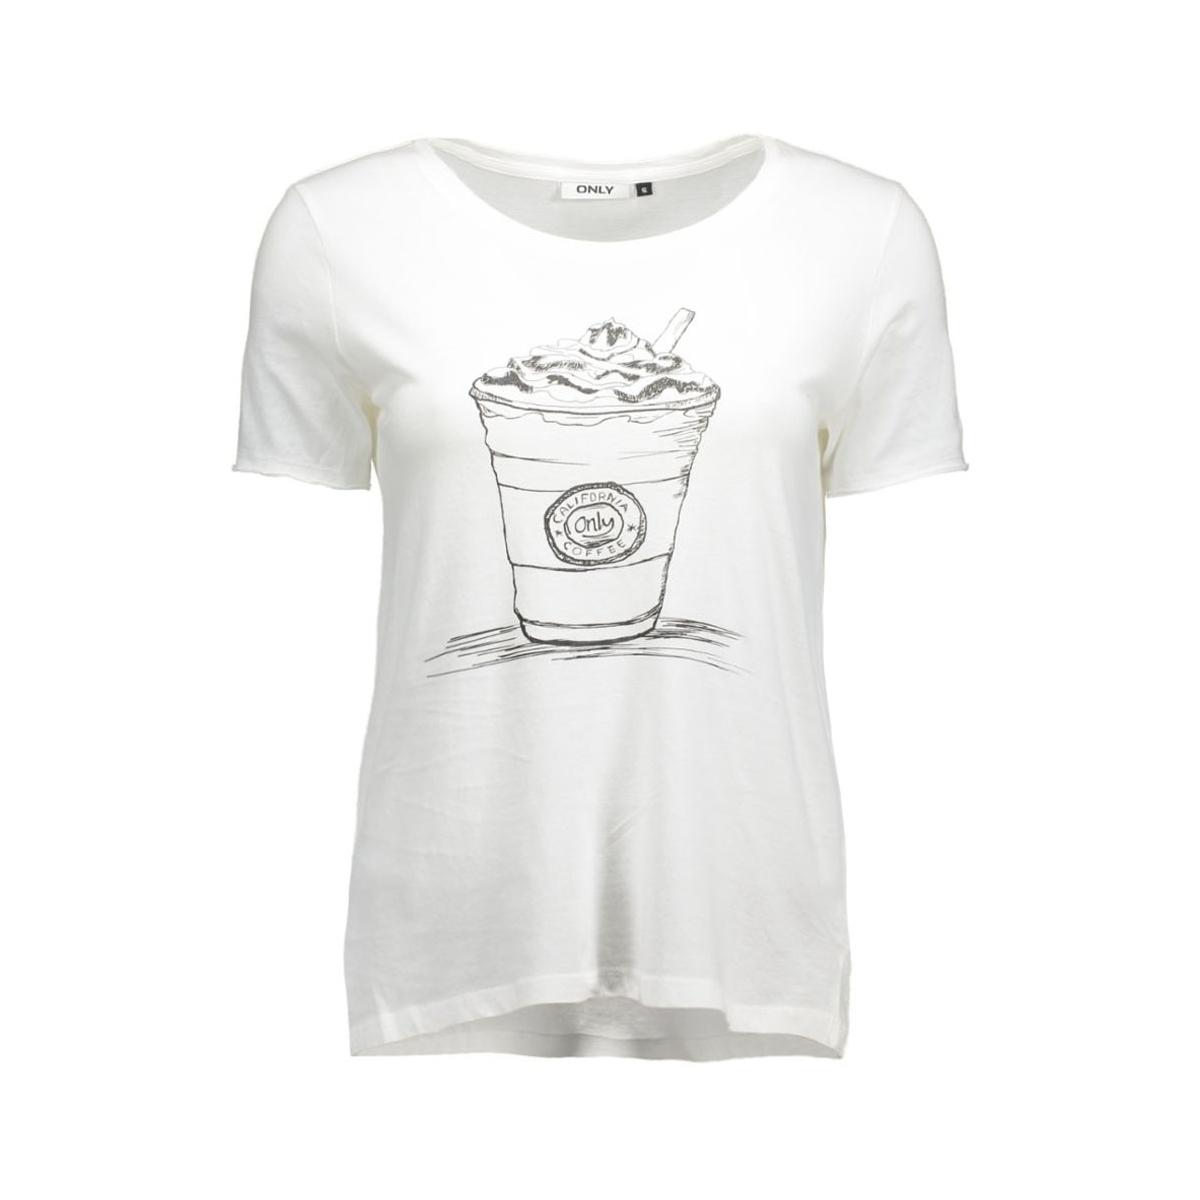 onlhappy s/s tee jrs 15119549 only t-shirt cloud dancer/milkshake